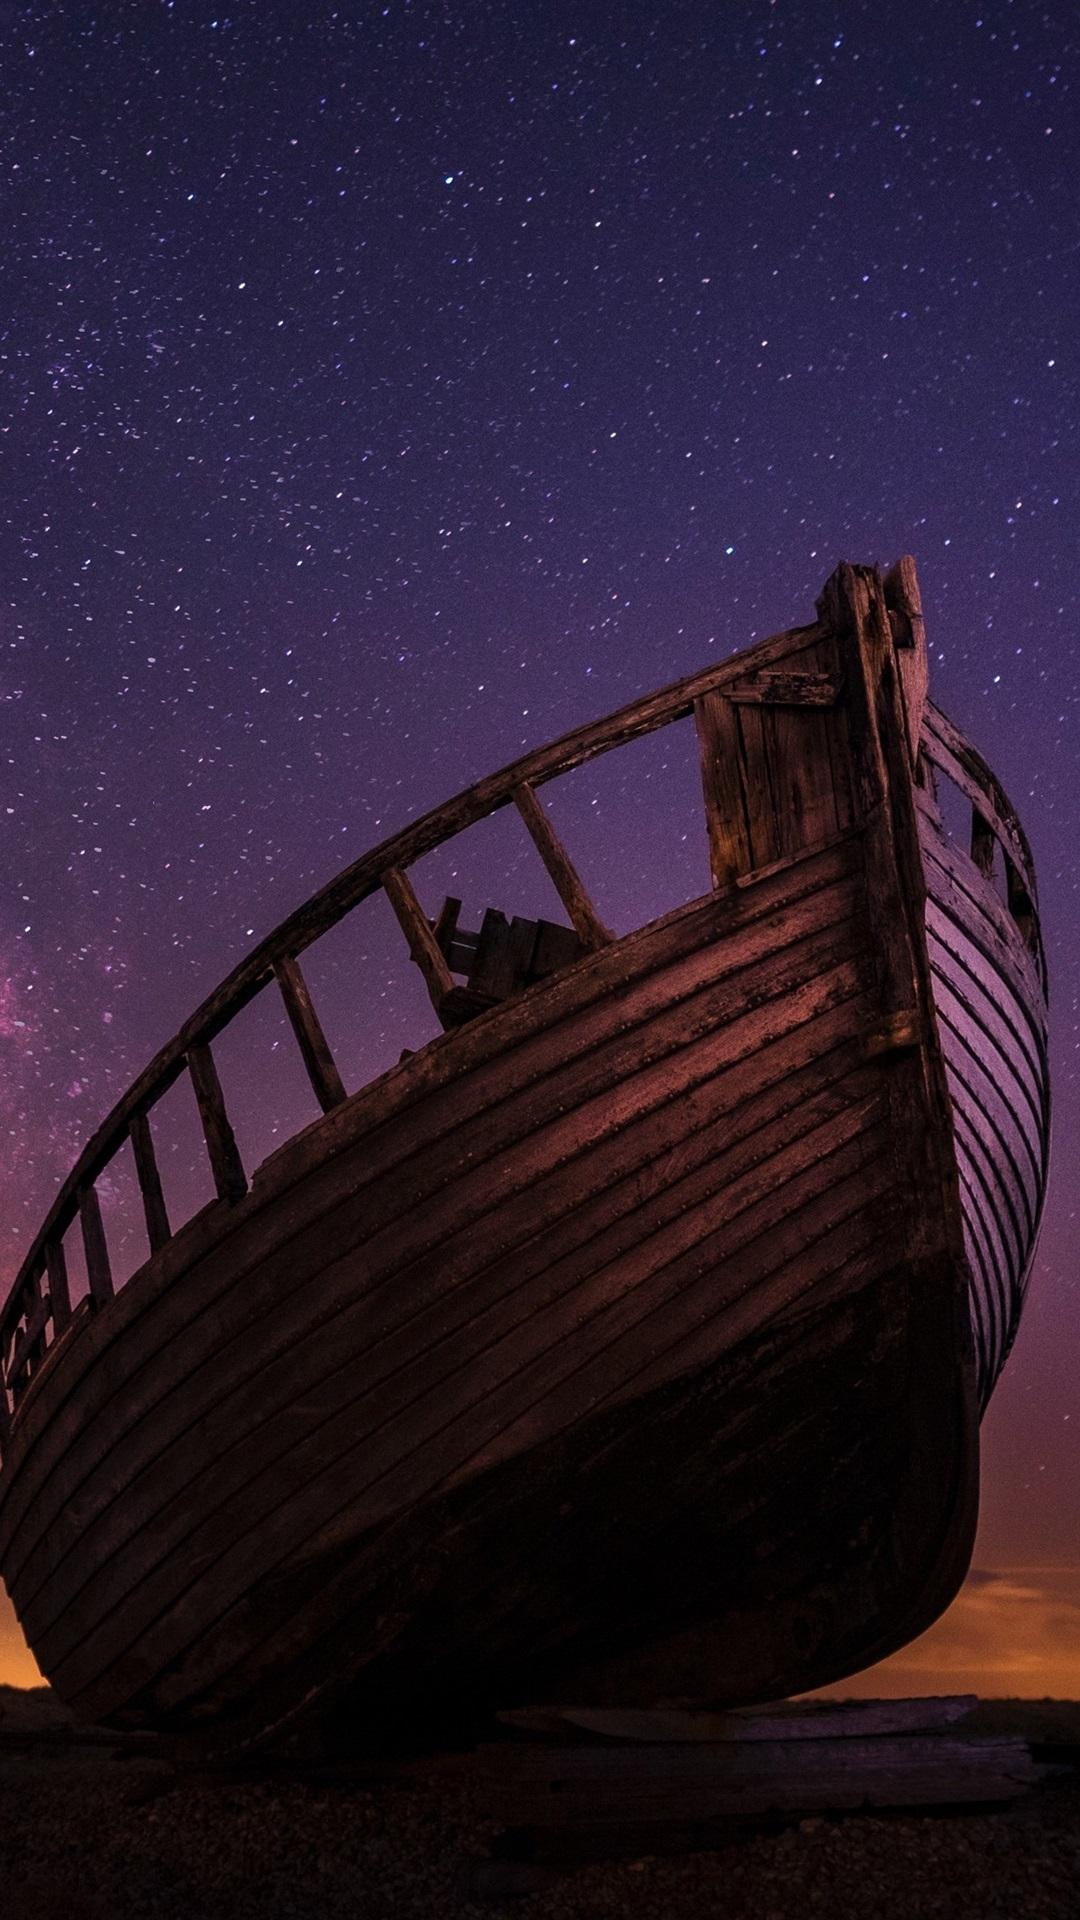 Wood Boat Starry Night Sky 1080x1920 Iphone 8 7 6 6s Plus